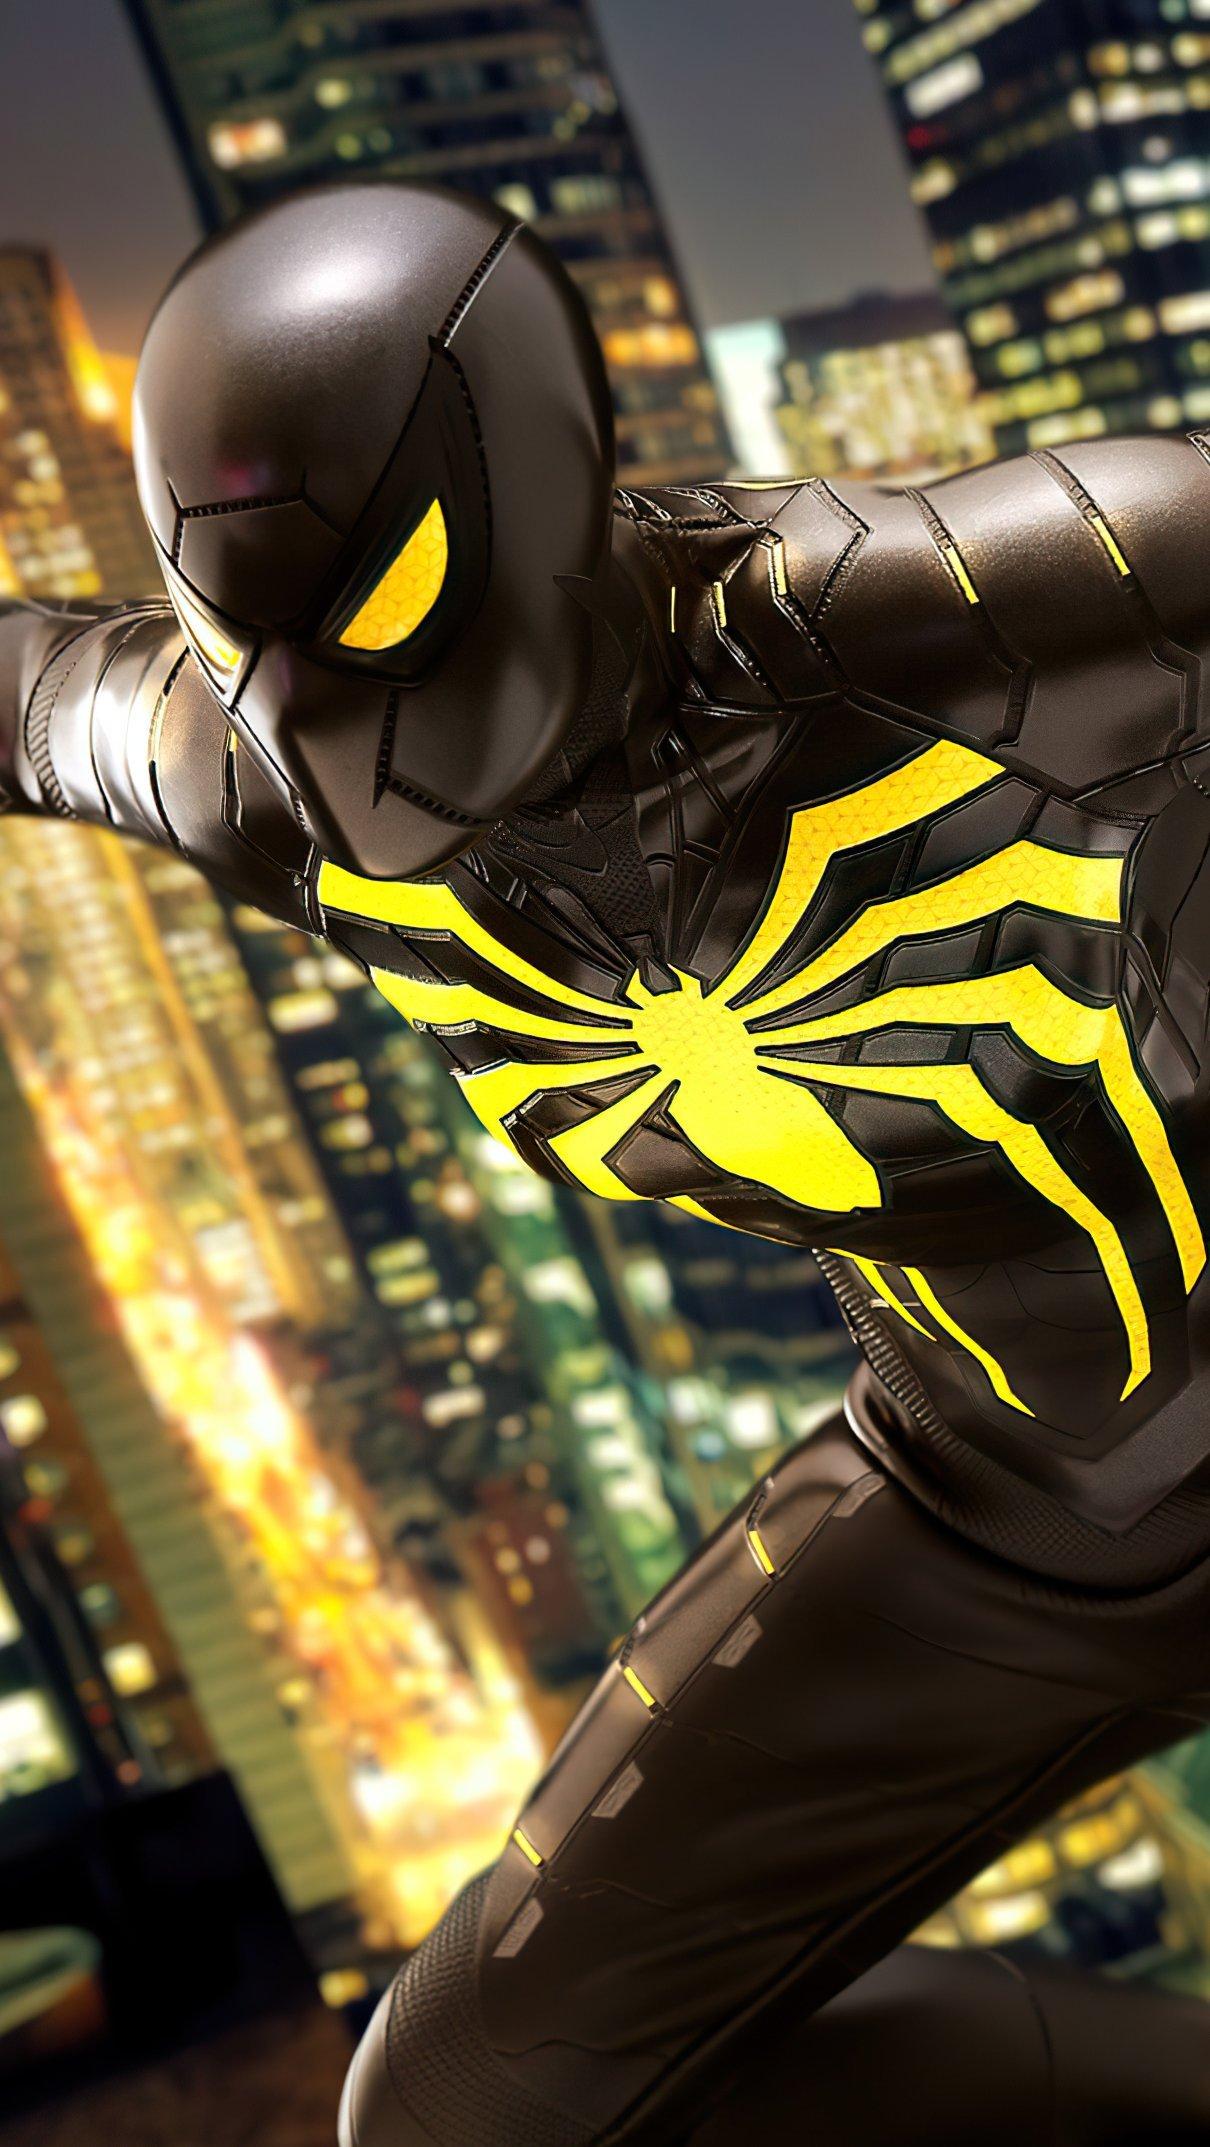 Fondos de pantalla Hombre araña traje Anti Ock Vertical